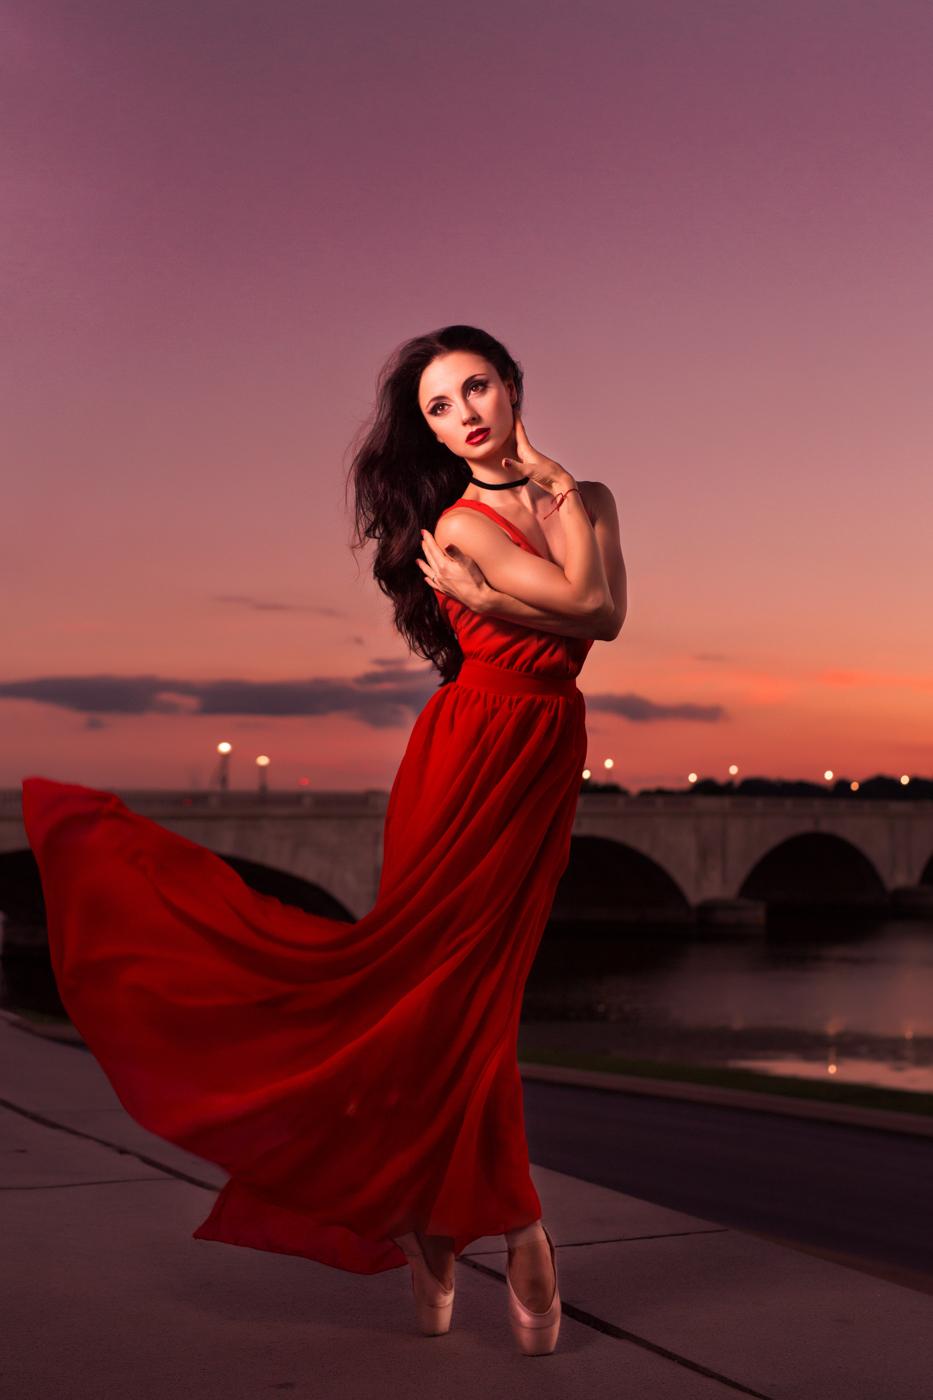 russian-ballet-dancer-on-the-street-of-washington-dc-ksenia-pro-photography-4